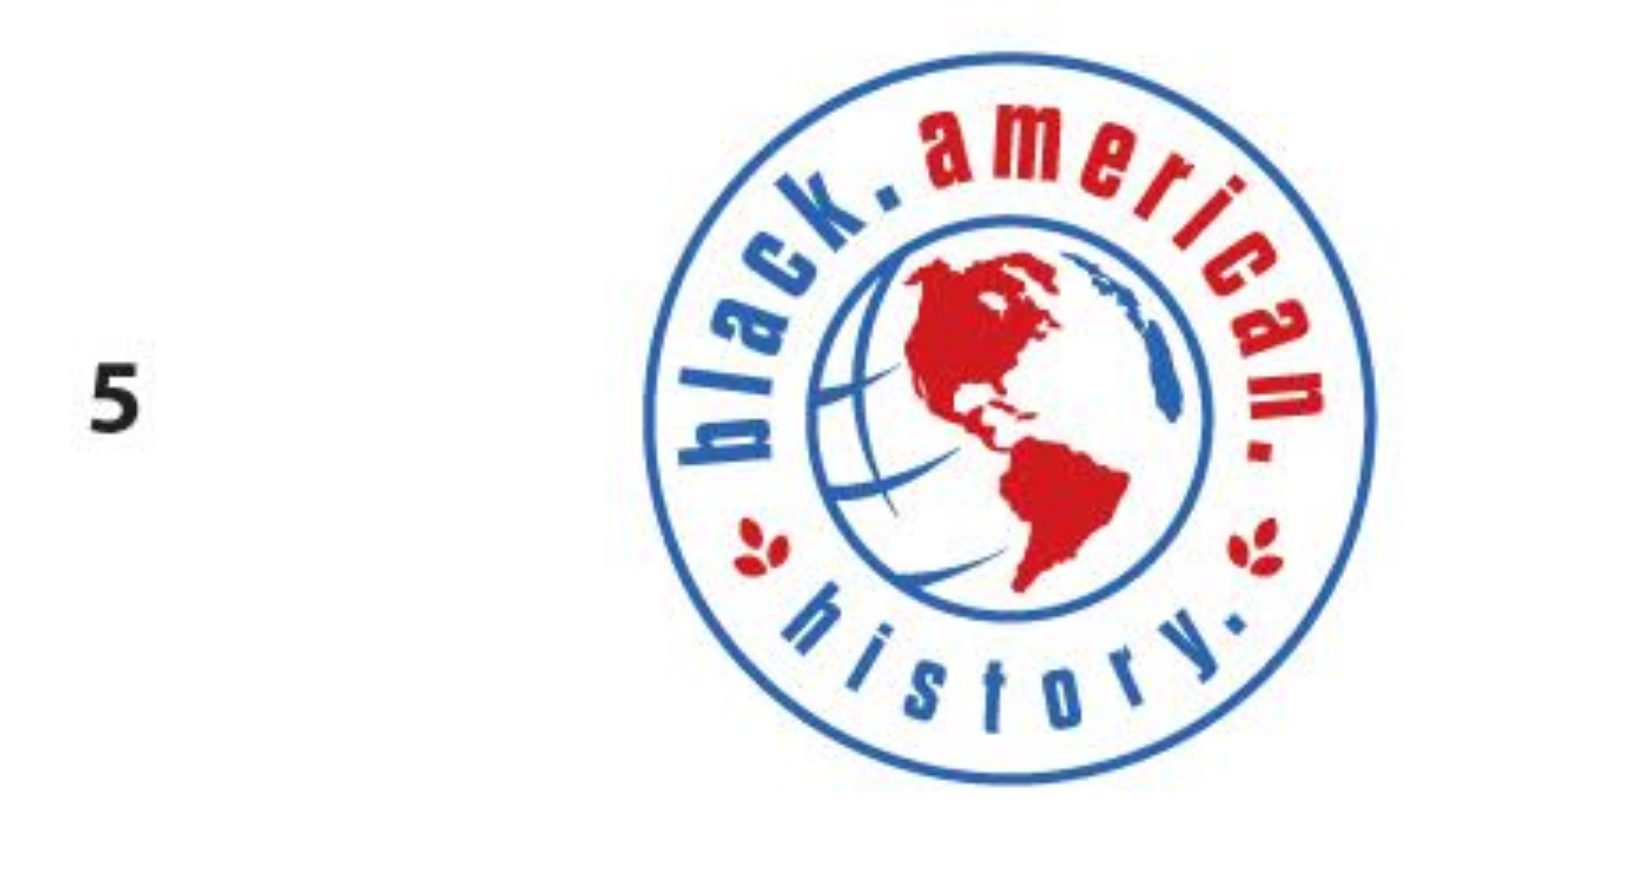 Black American History - Logo Design Concept 05